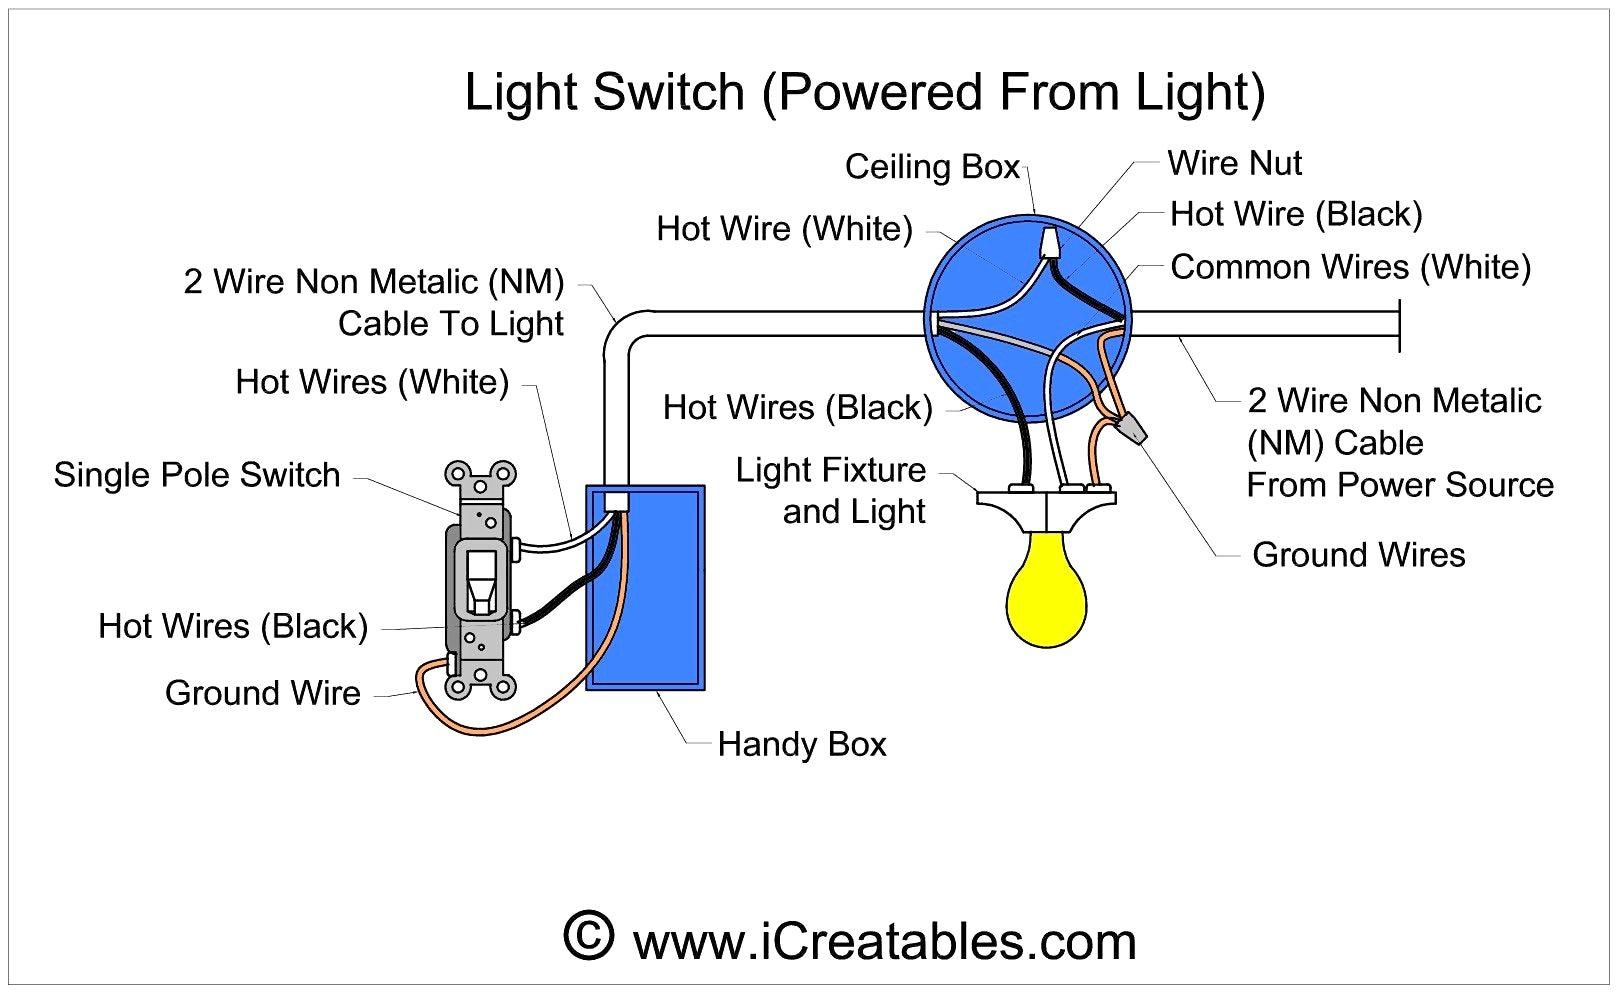 S3 Single Pole Switch Diagram - Data Wiring Diagram Detailed - Single Pole Switch Wiring Diagram